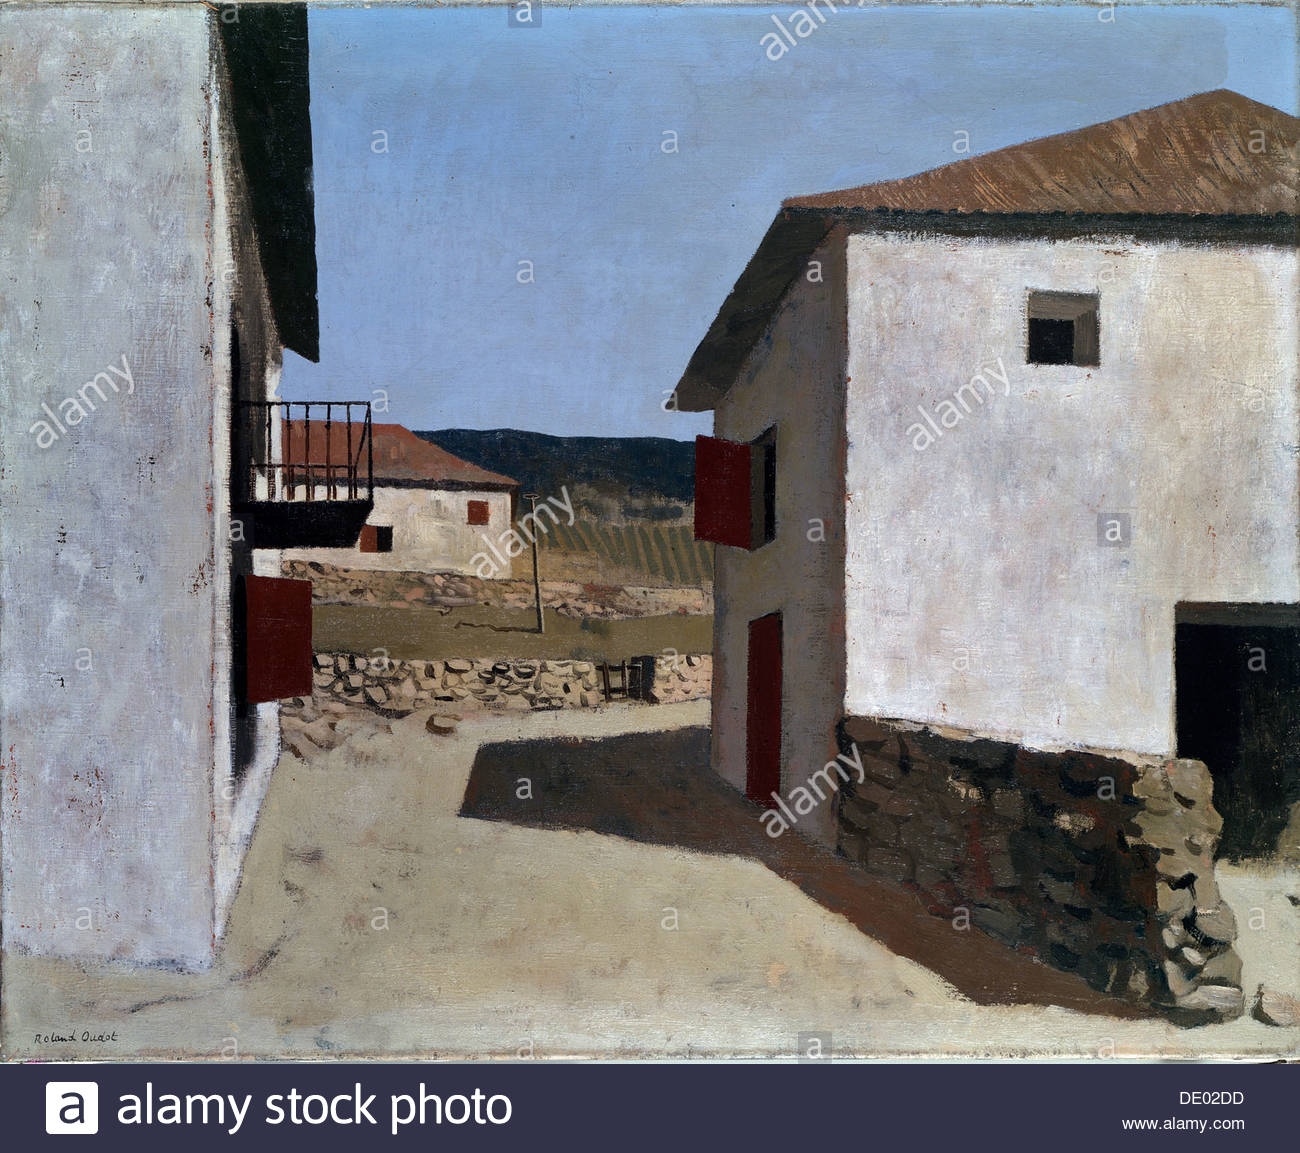 'The Basque Provinces', 20th century. Artist: Roland Oudot - Stock Image